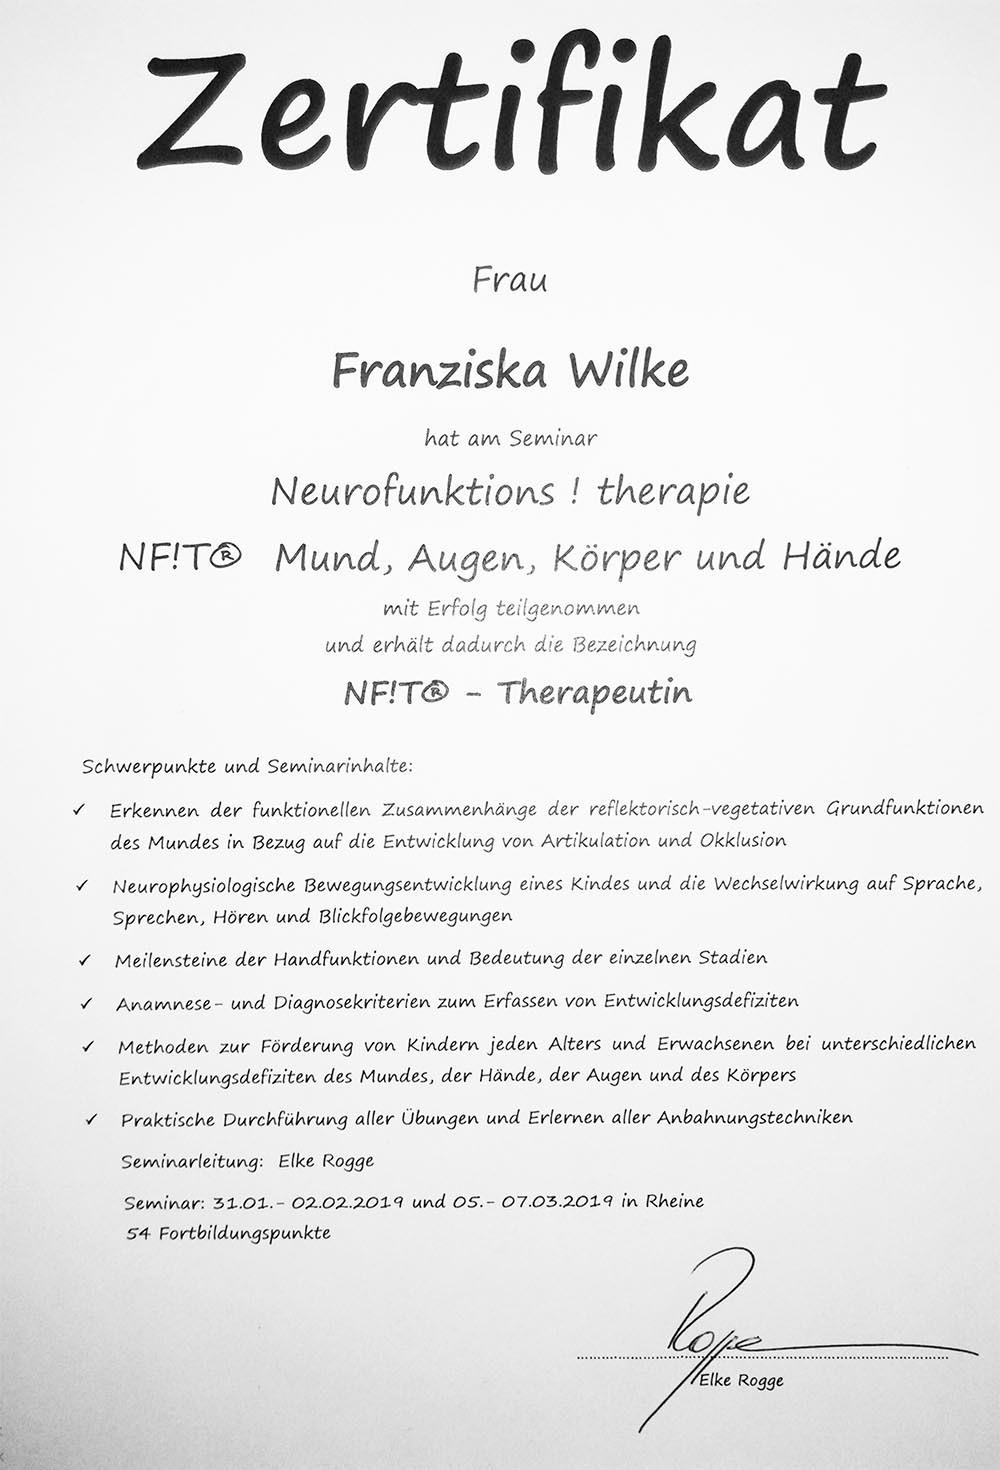 Zertifikat nft für Logopädin Franziska Wilke Potsdam